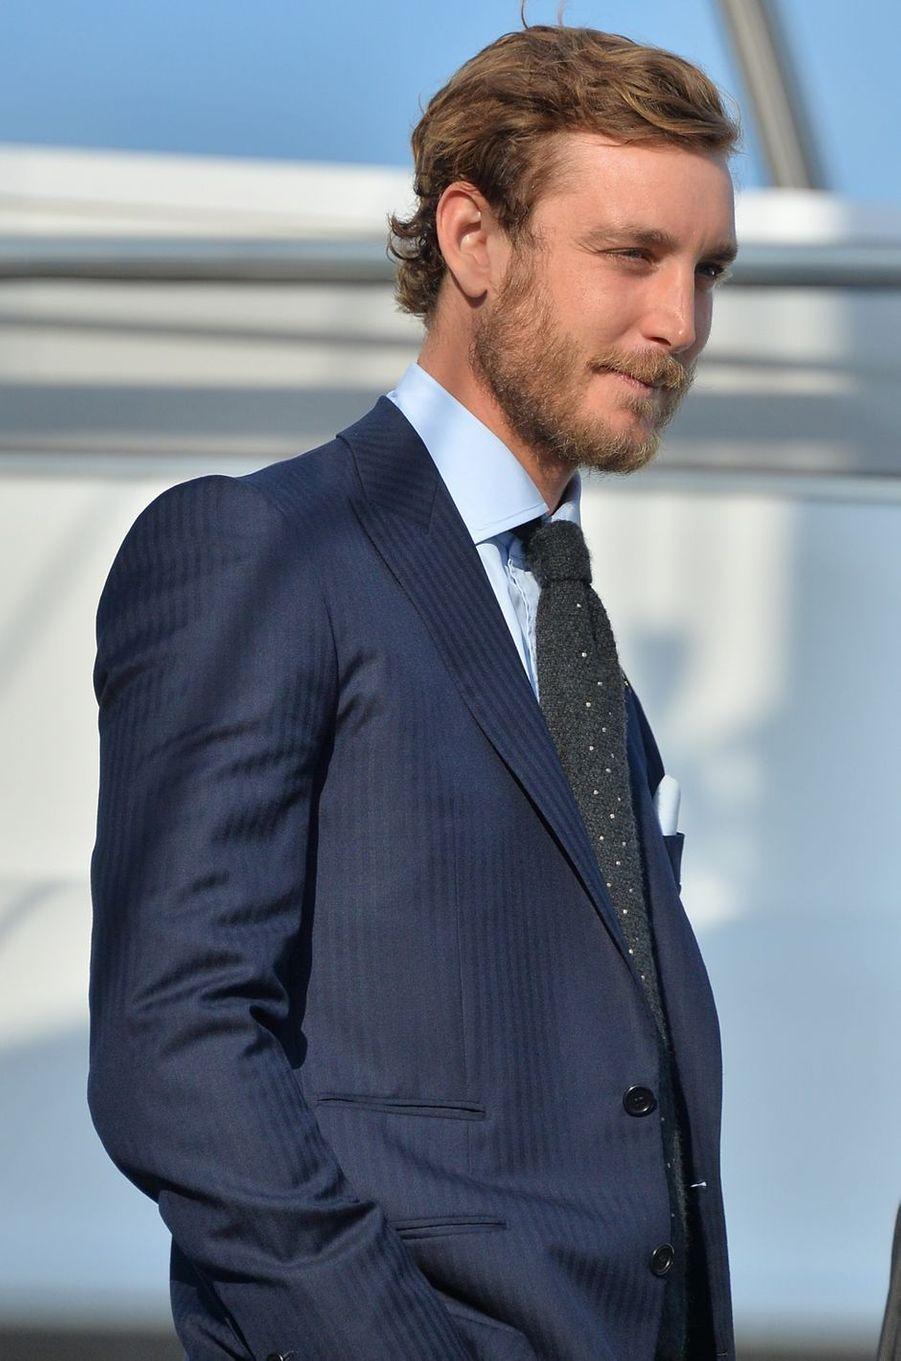 Pierre Casiraghi à Monaco, le 6 mai 2016